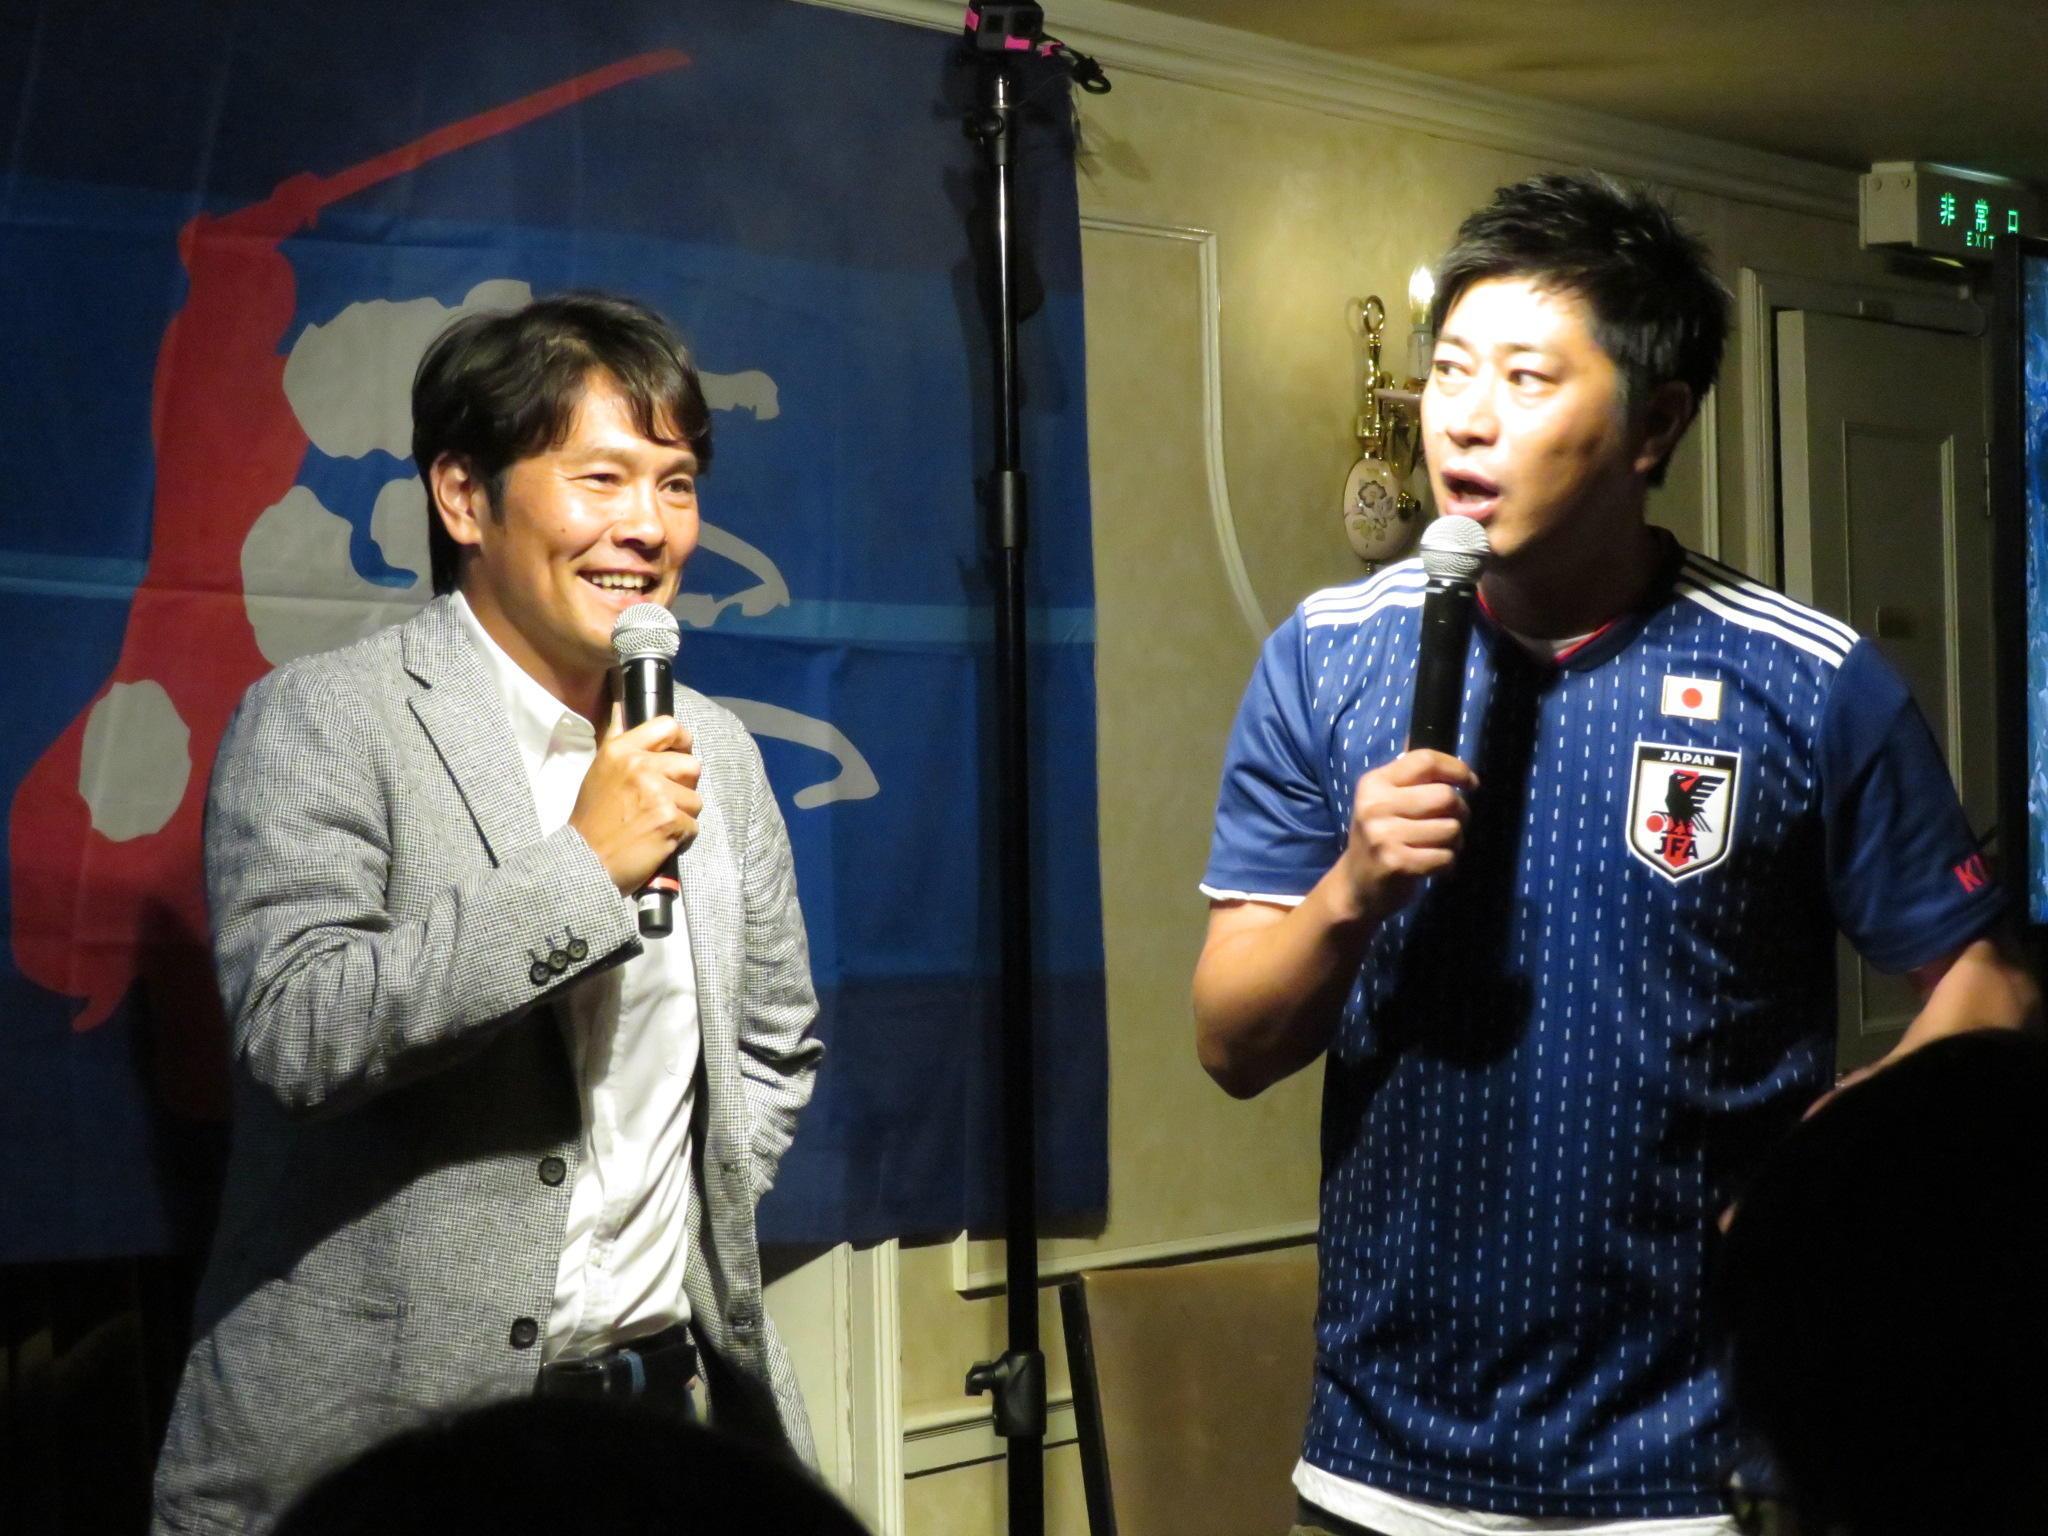 http://news.yoshimoto.co.jp/20180531141723-95cdae2c73ccf6571d6e1c72ad92af7329b32e82.jpg